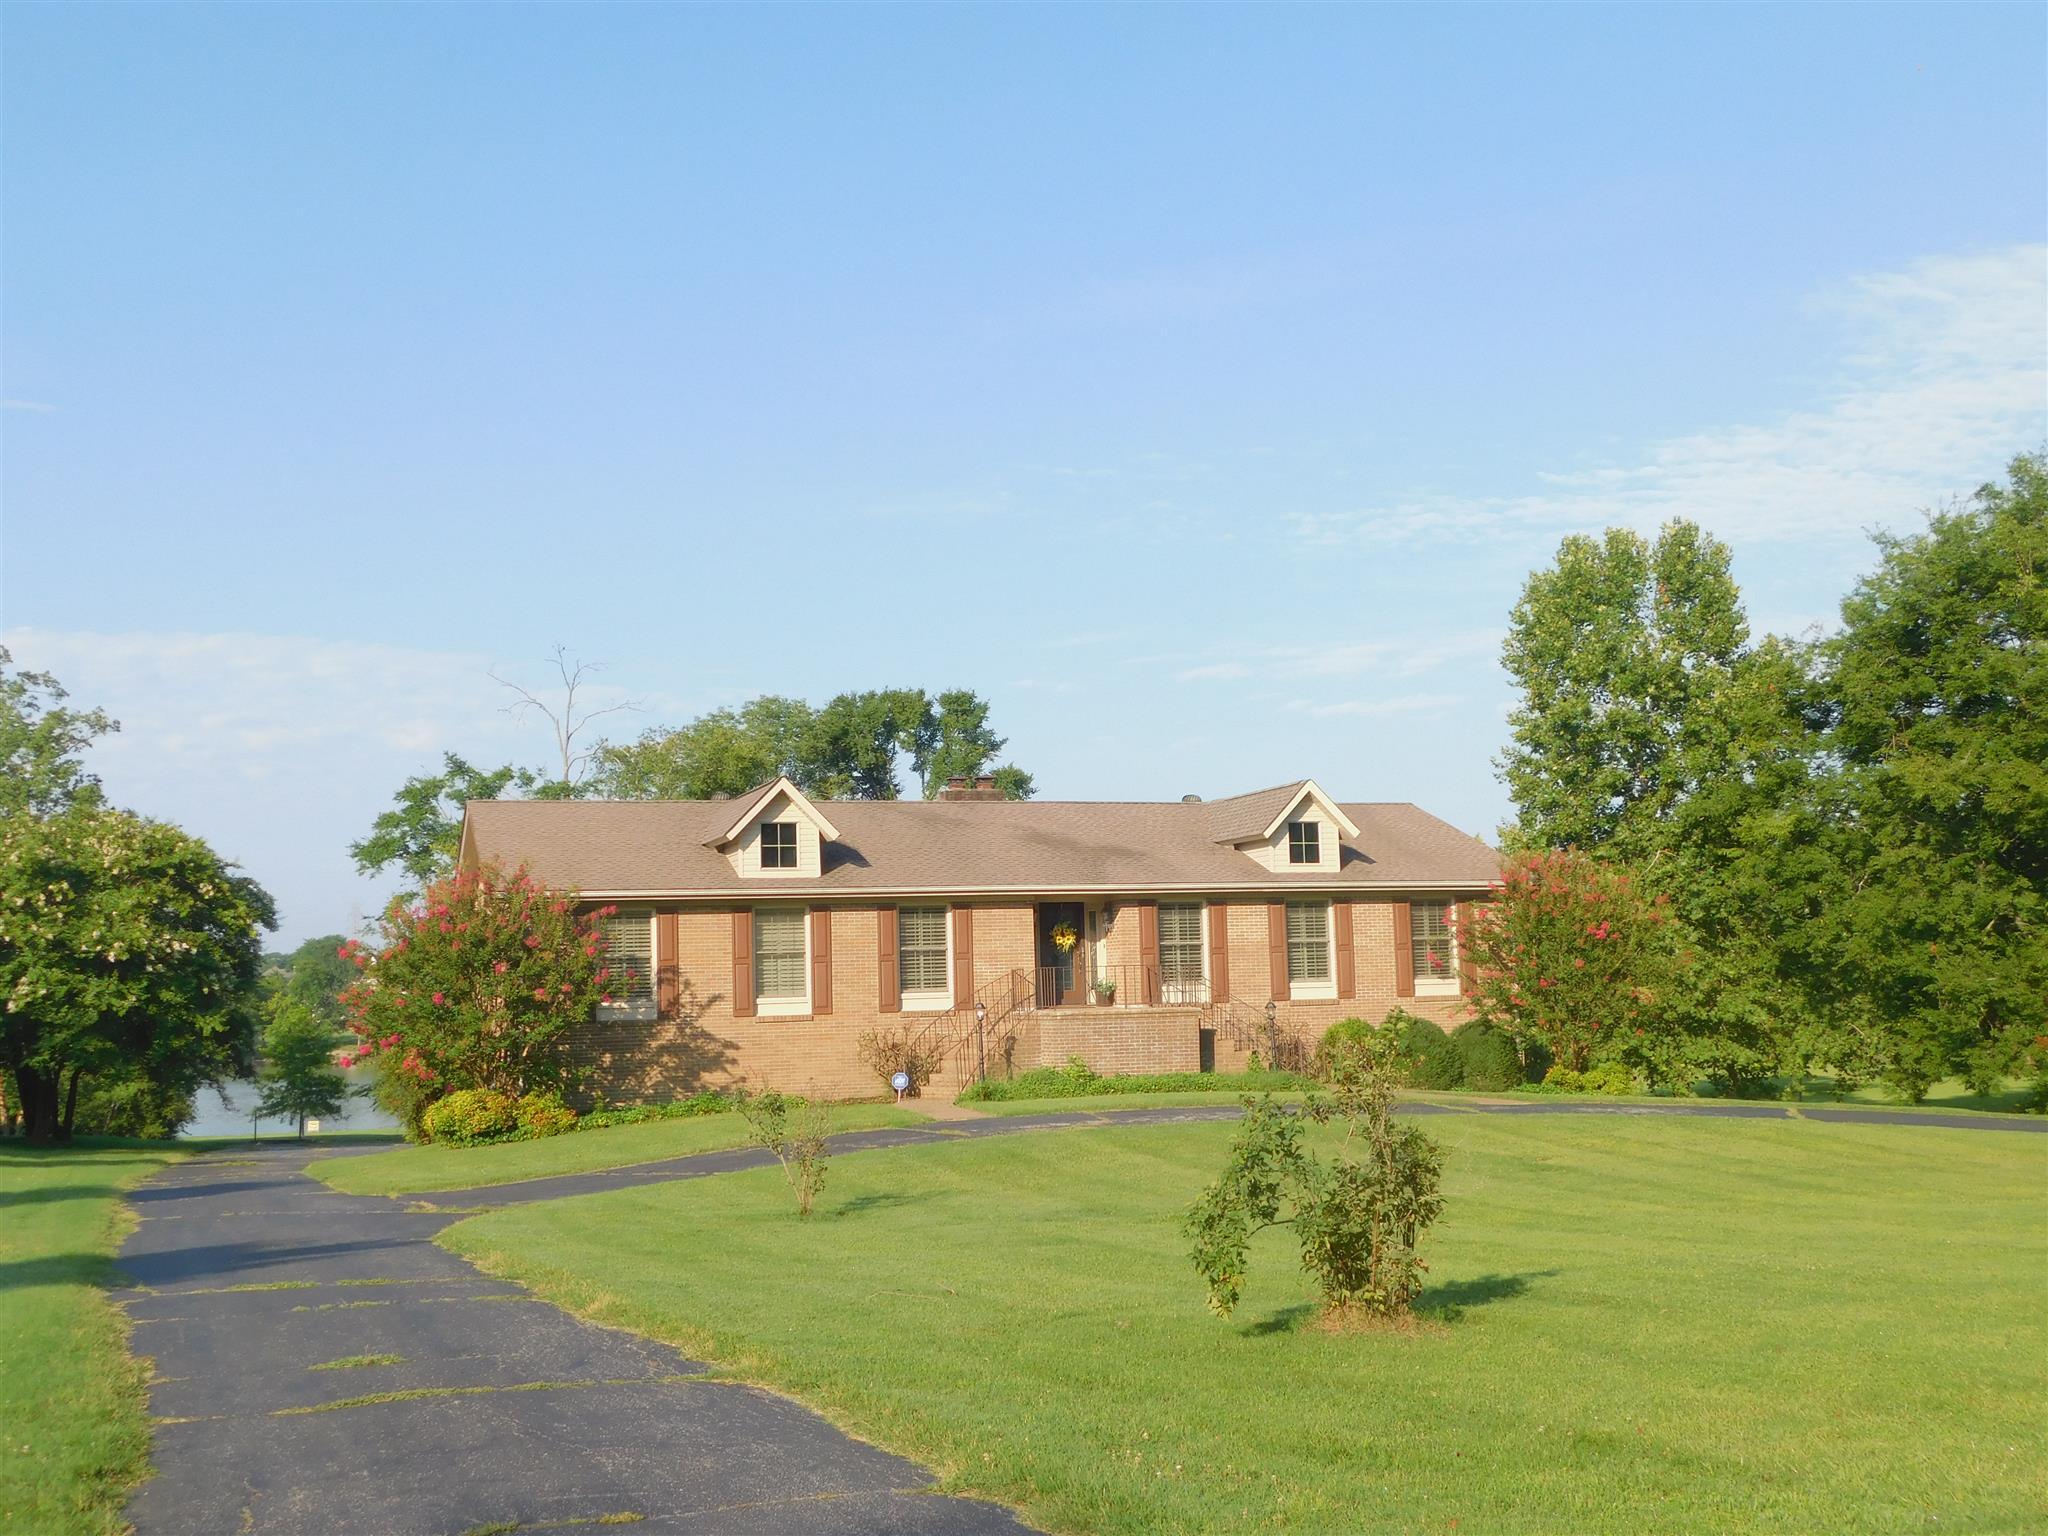 1056 Lakeshore Dr, Gallatin, TN 37066 - Gallatin, TN real estate listing